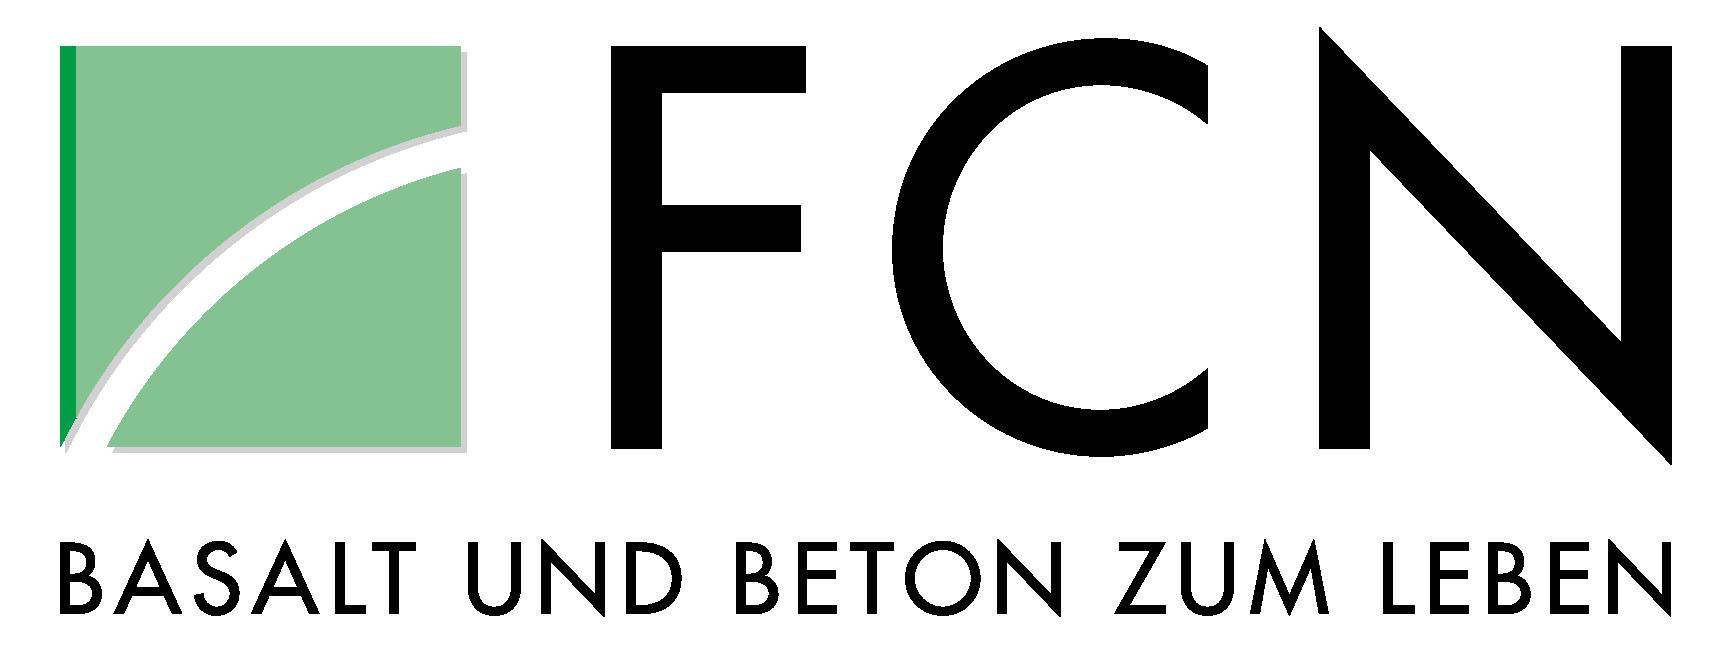 FRANZ CARL NÜDLING Basaltwerke GmbH & Co. KG Holding